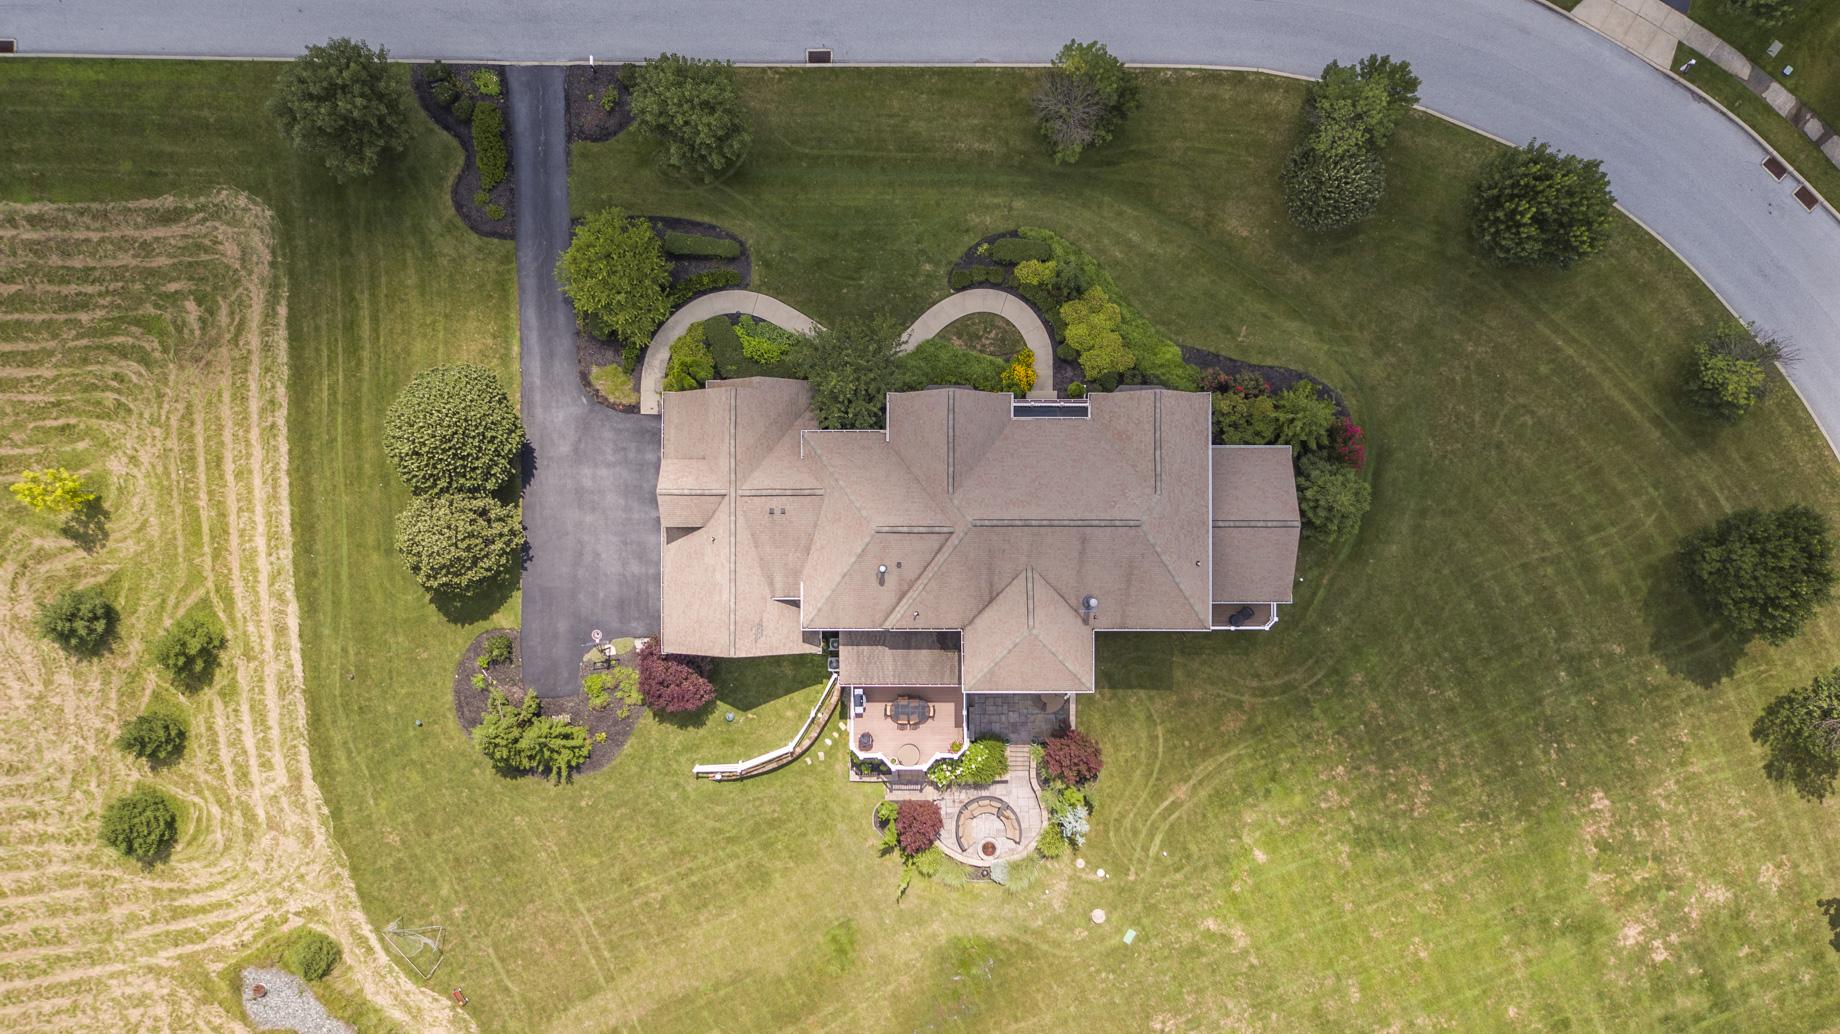 MLS 34 Hollow Drive (Drone HDR)11.jpg